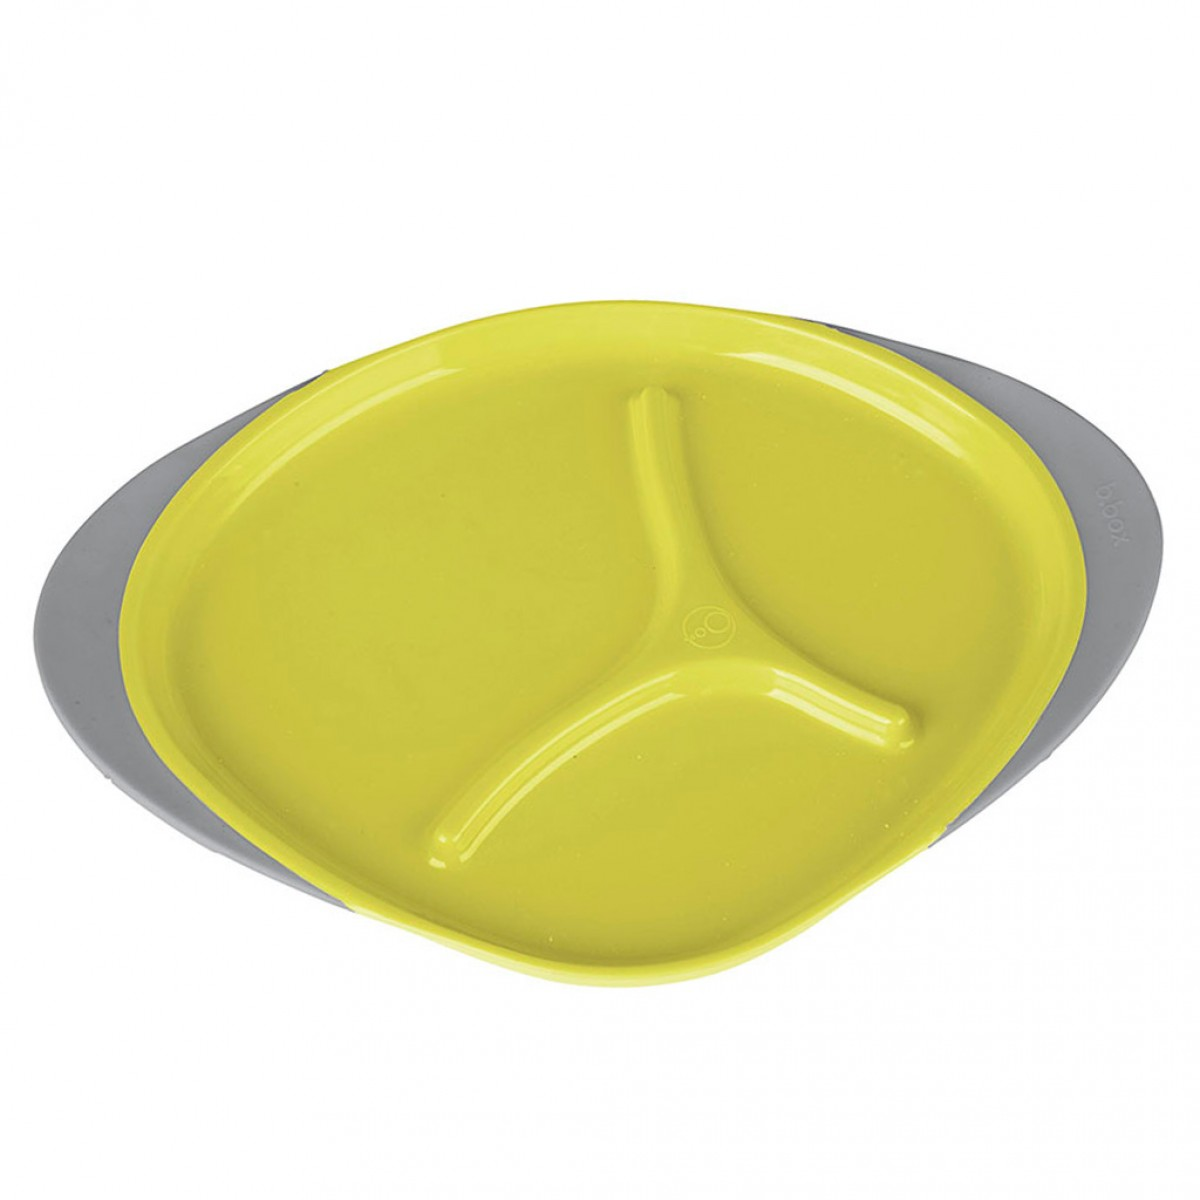 Feeding Set - Lemon Sherbet Yellow Grey